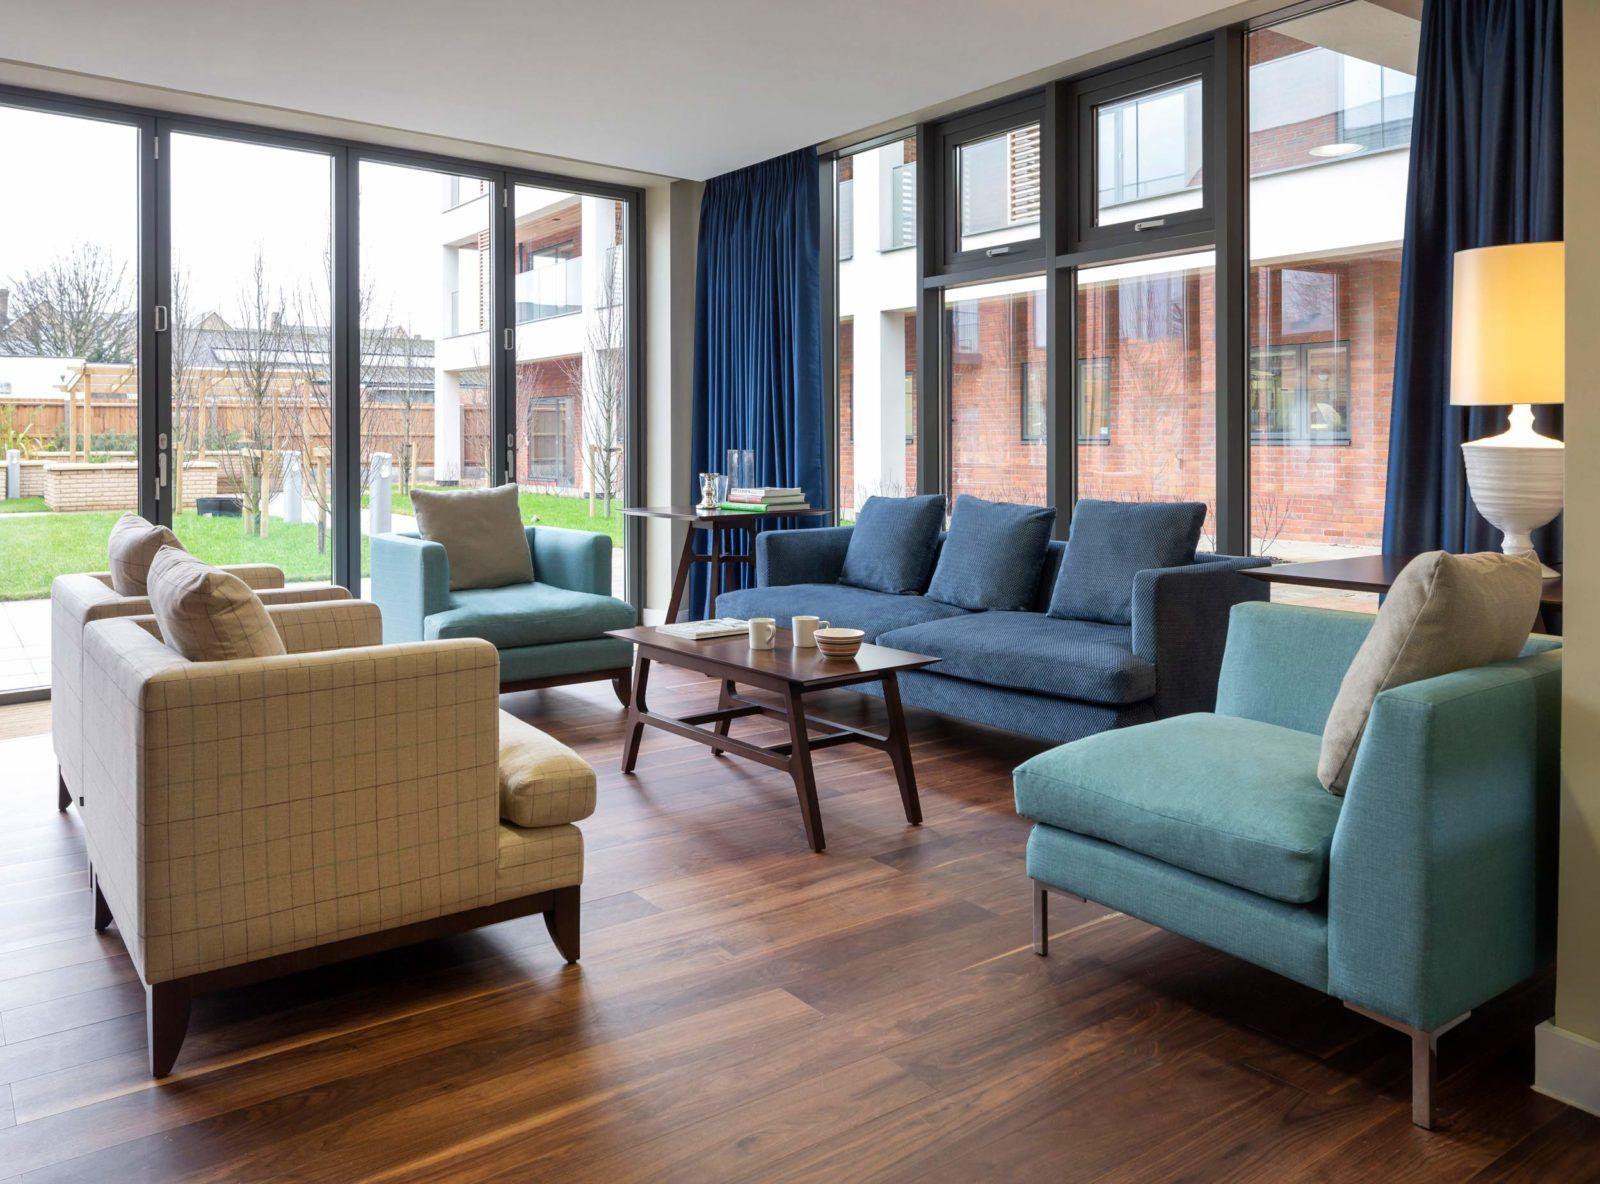 St bede   retirement village morgan furniture also healthcare rh pinterest